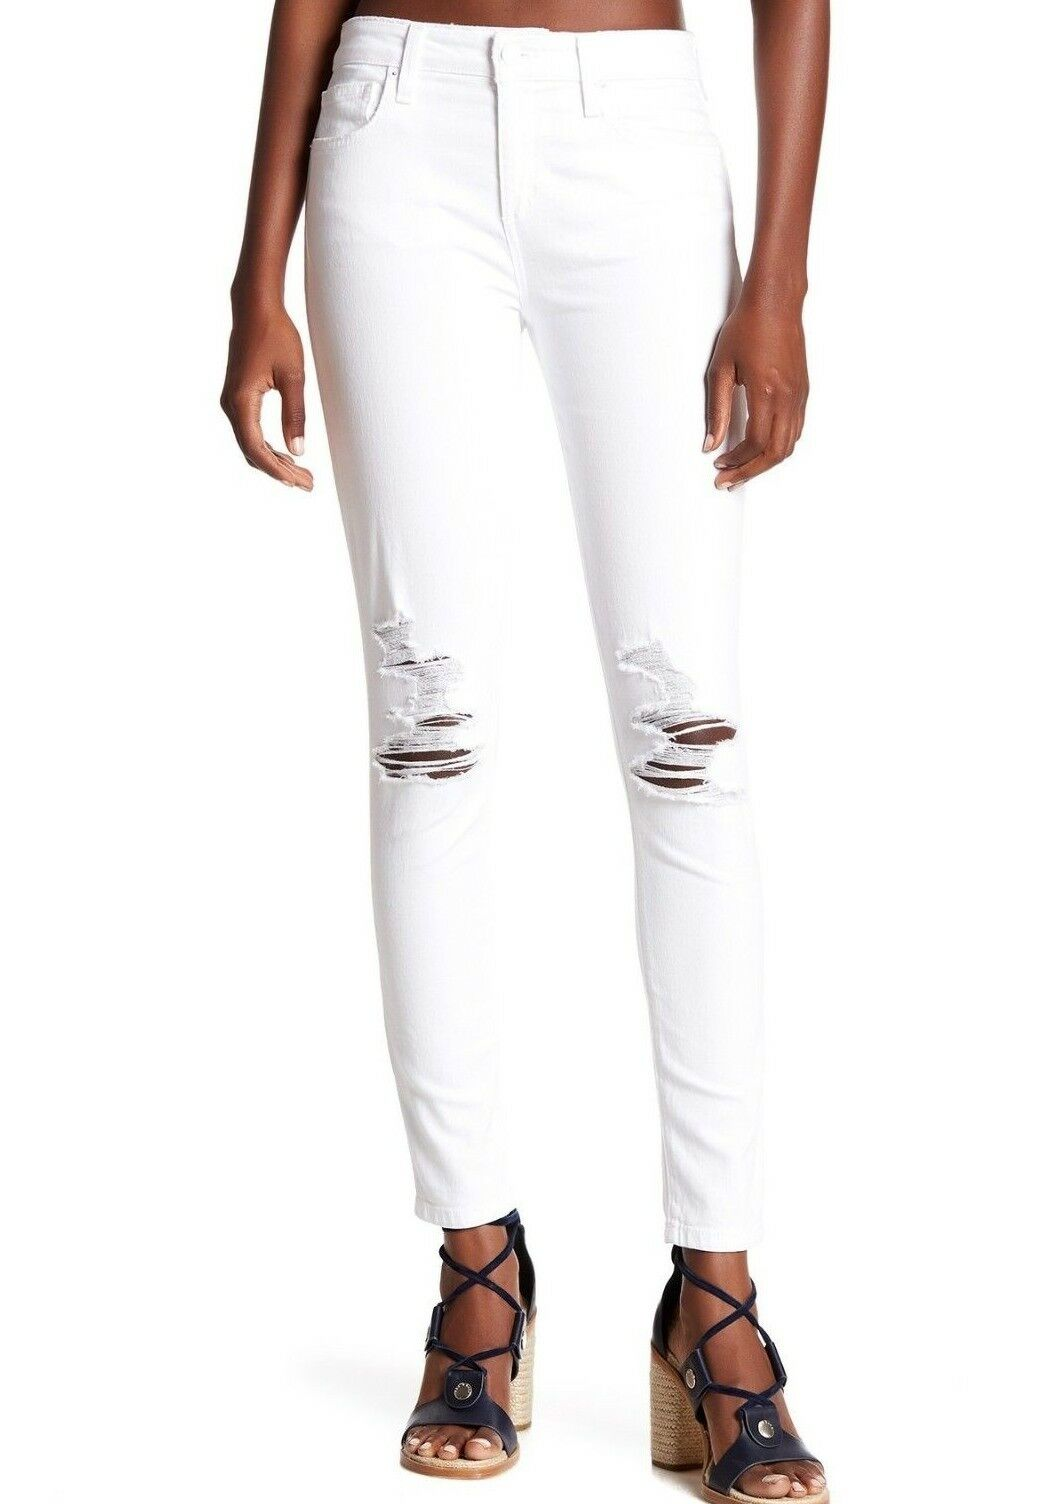 Nwt JOE´S Sz25 die Eng Anliegende Knöchel Midrise Jeans Stretch Distressed